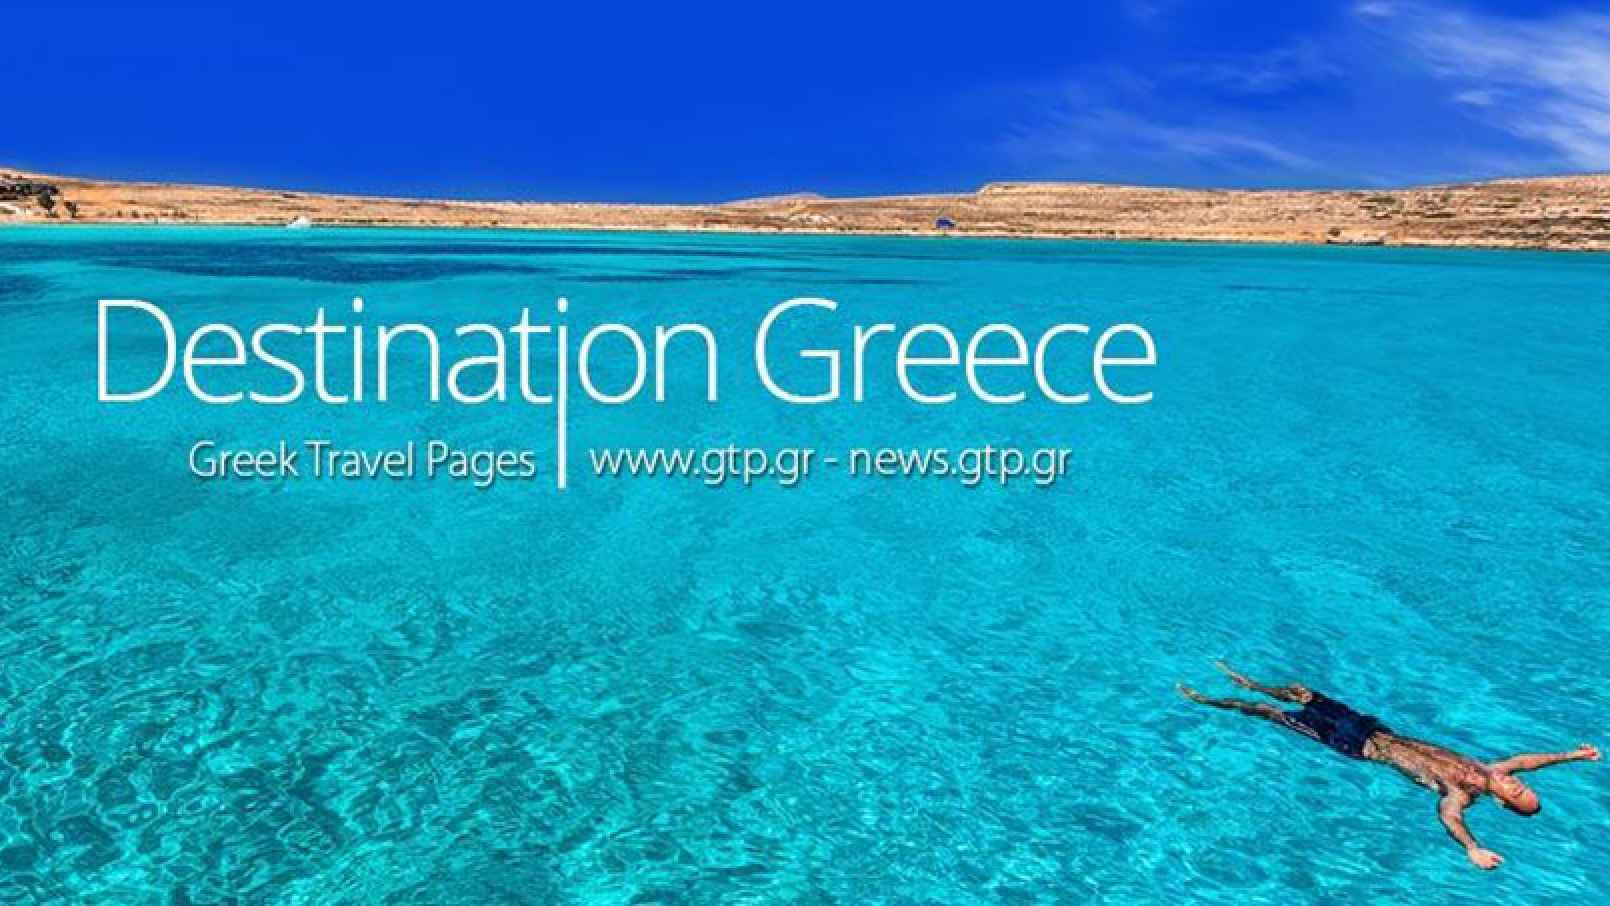 Greek Travel Pages  4bf4dbd189e